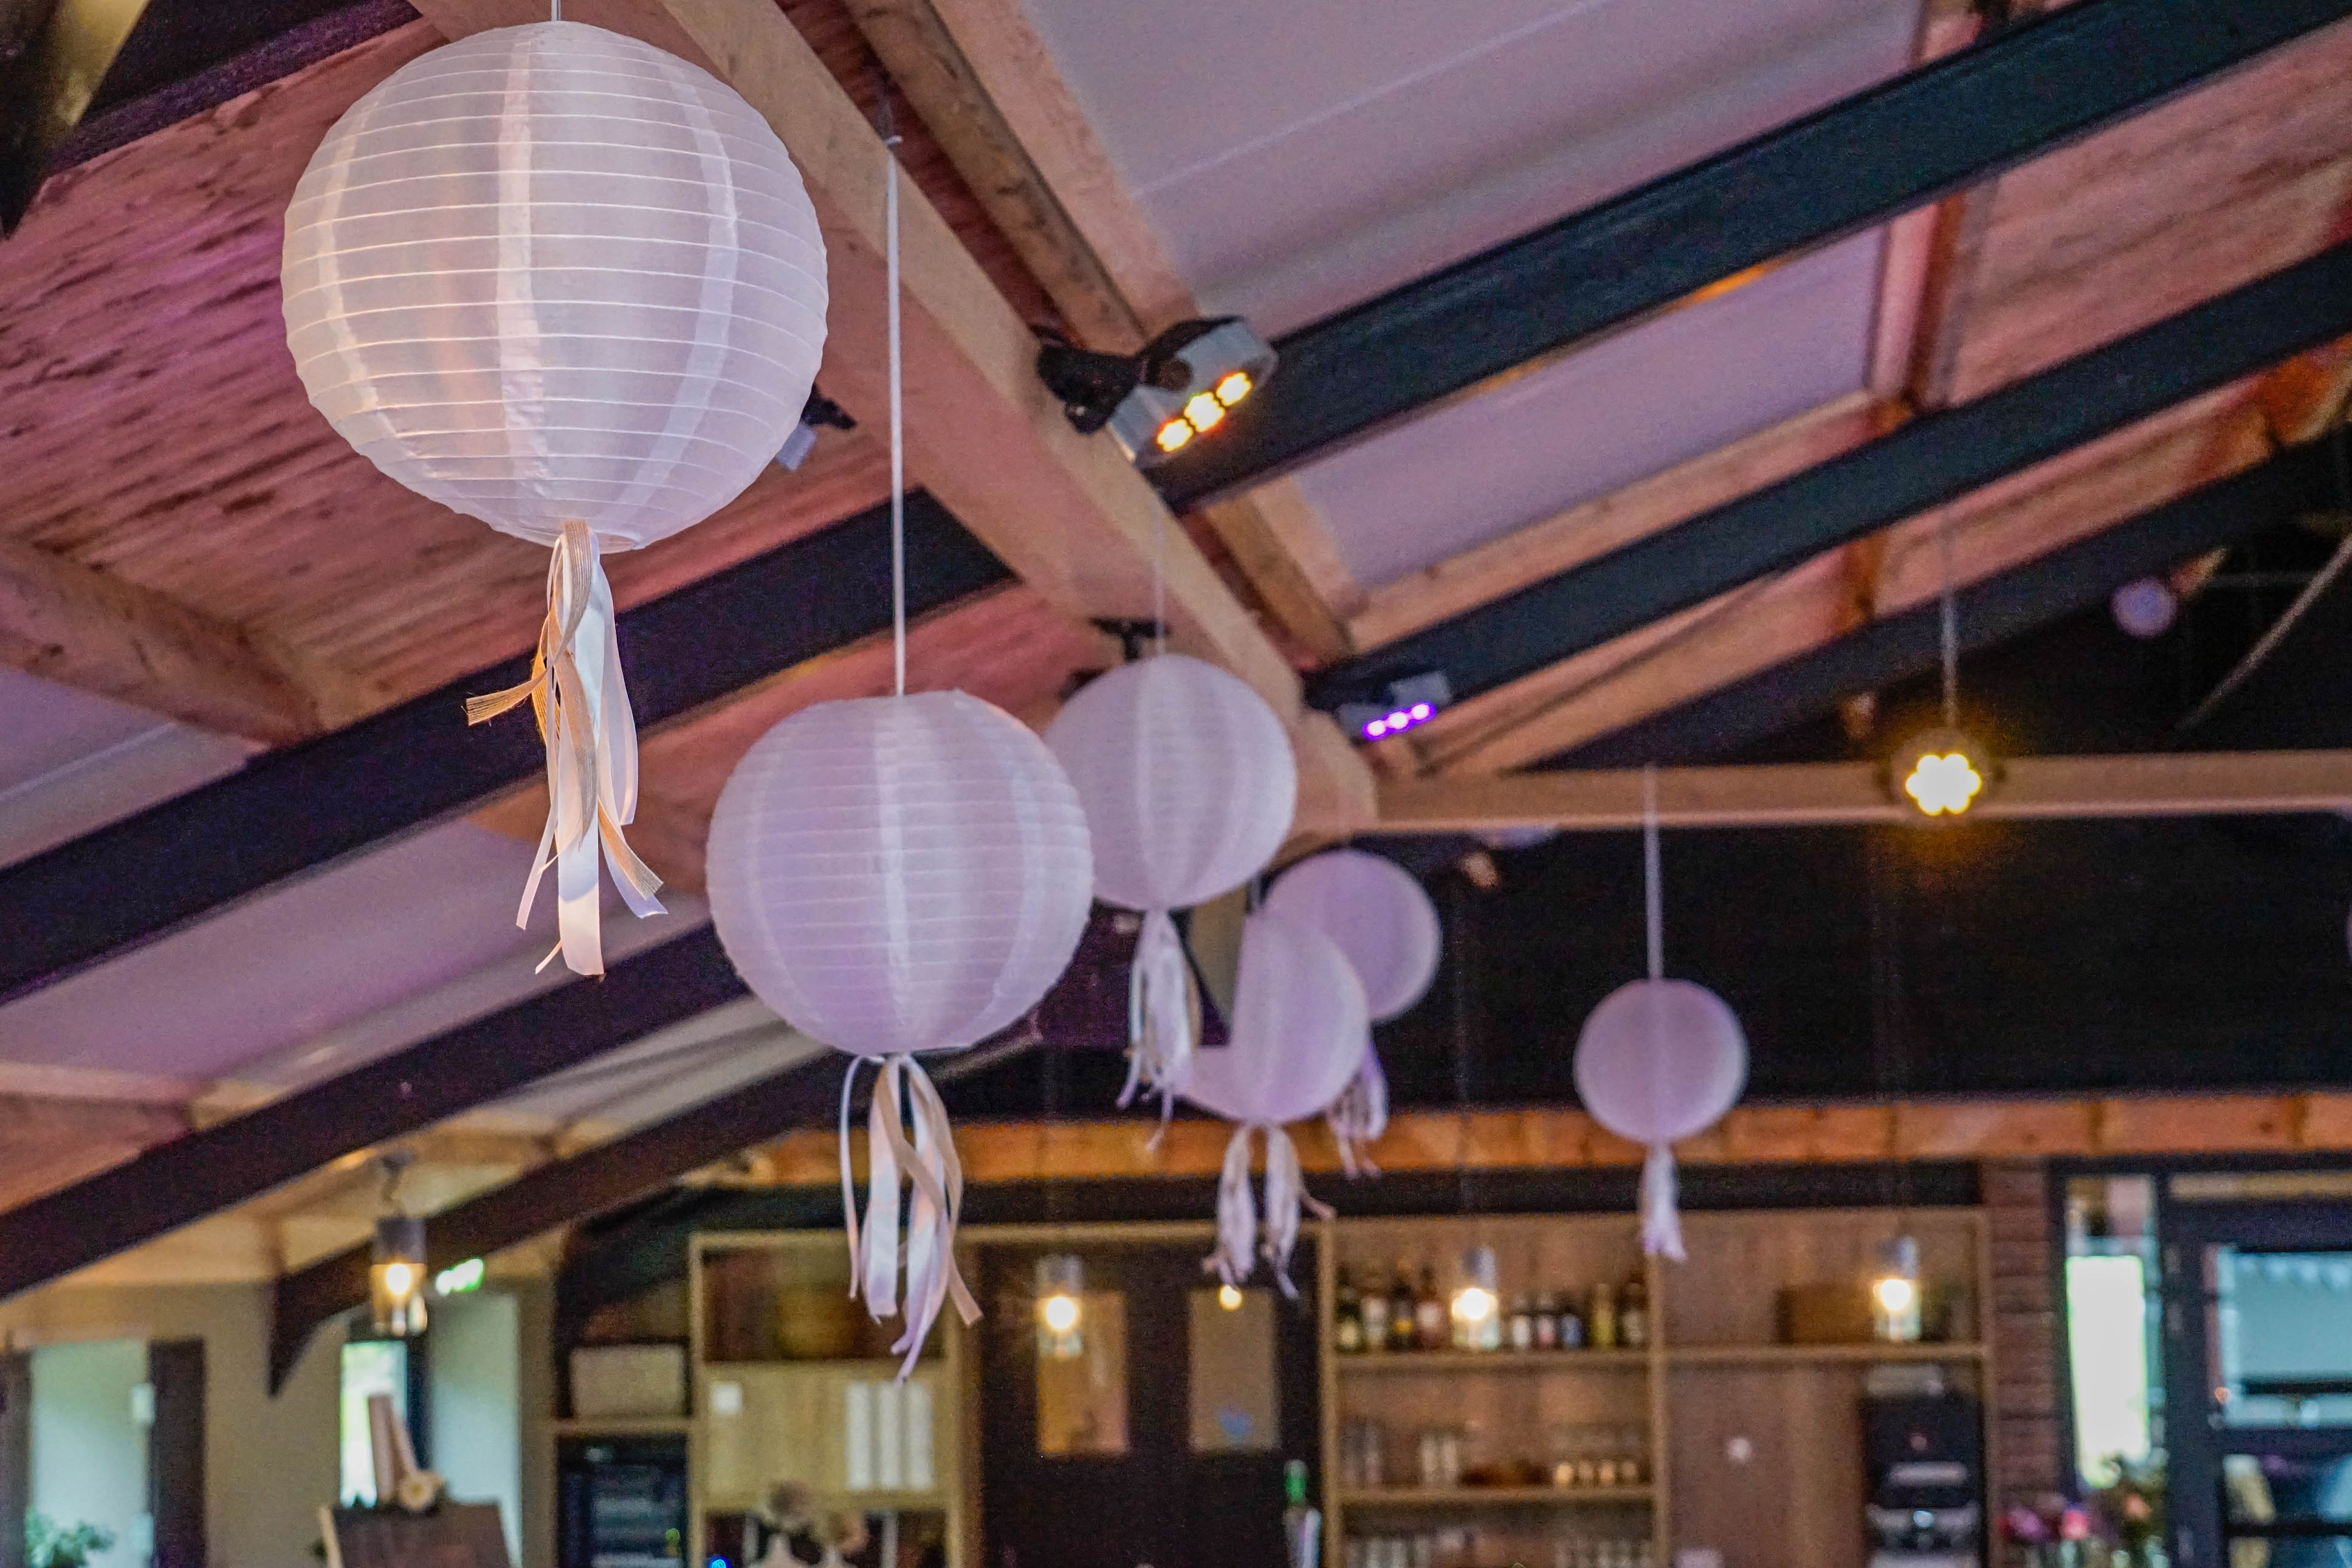 Trouw lampionnen in het Karnhuis | Boerderij de Boerinn